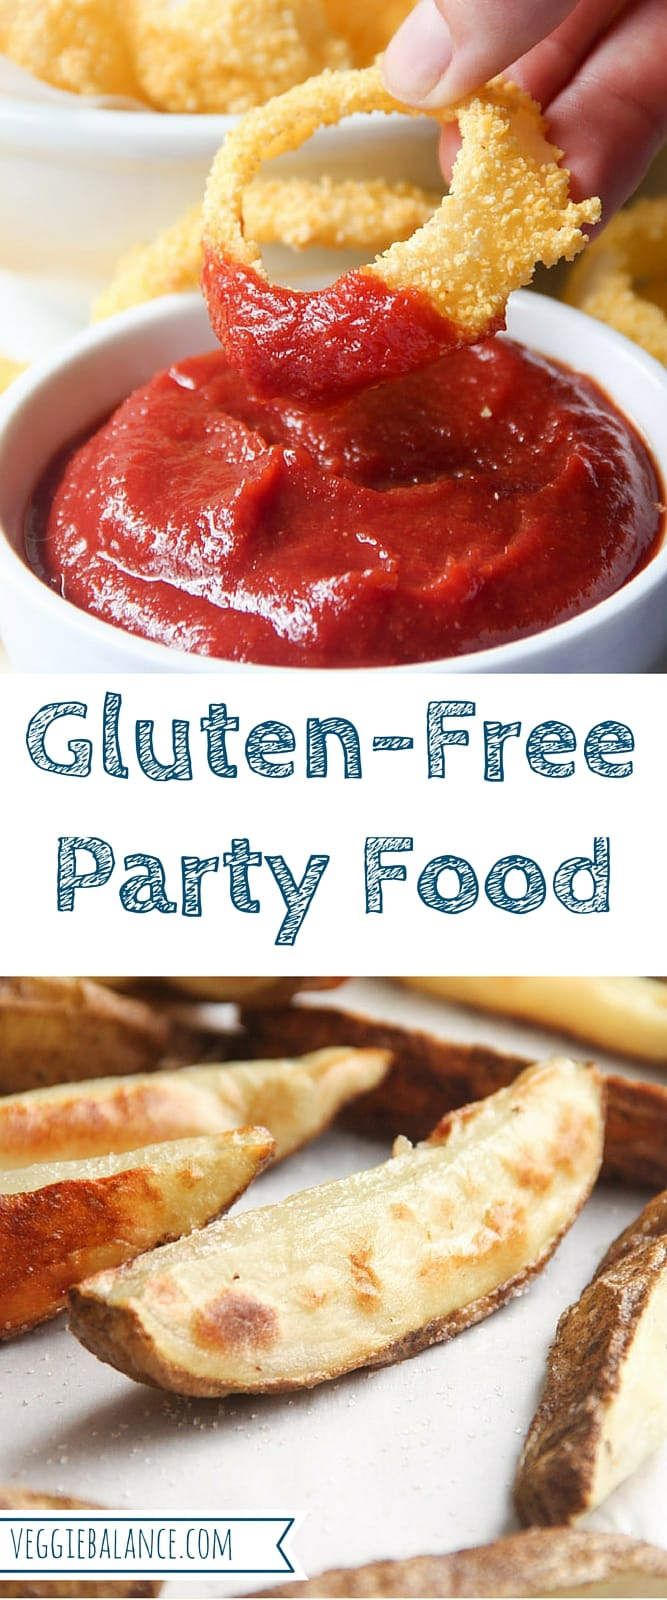 Gluten-Free Party Food Cookbook